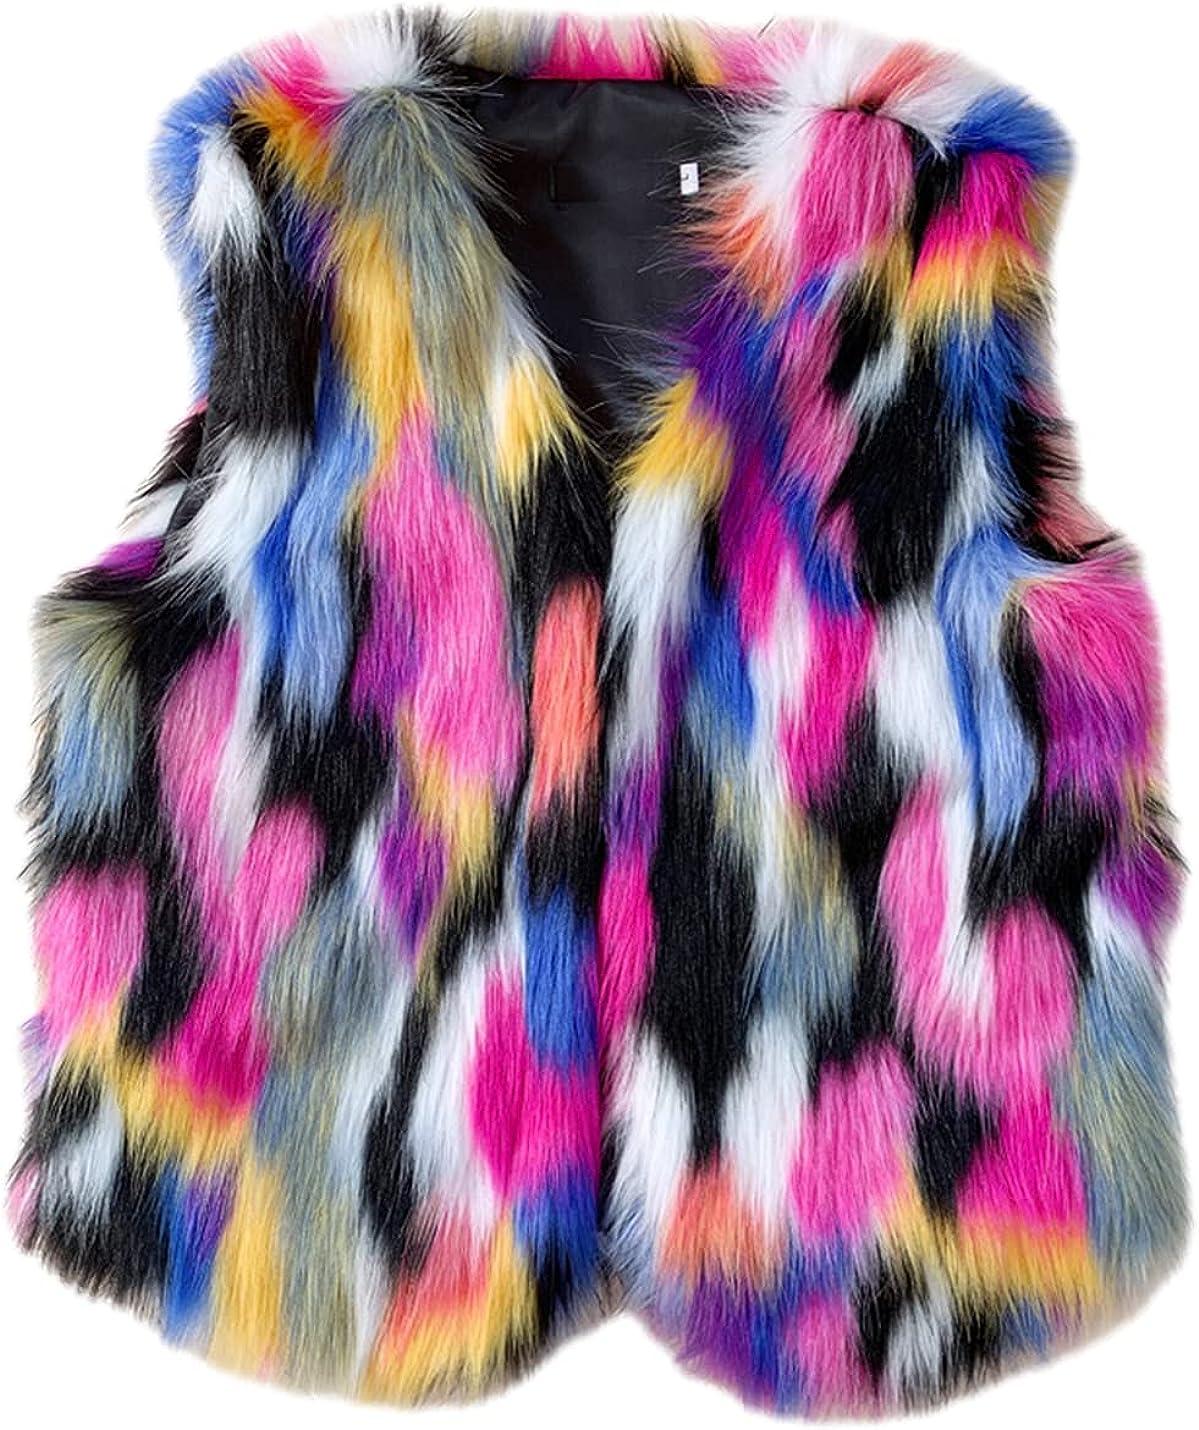 SeekMe Women's Faux Fur Color Block Shiny Vest Button Down Warm Fluffy Sleeveless Coat